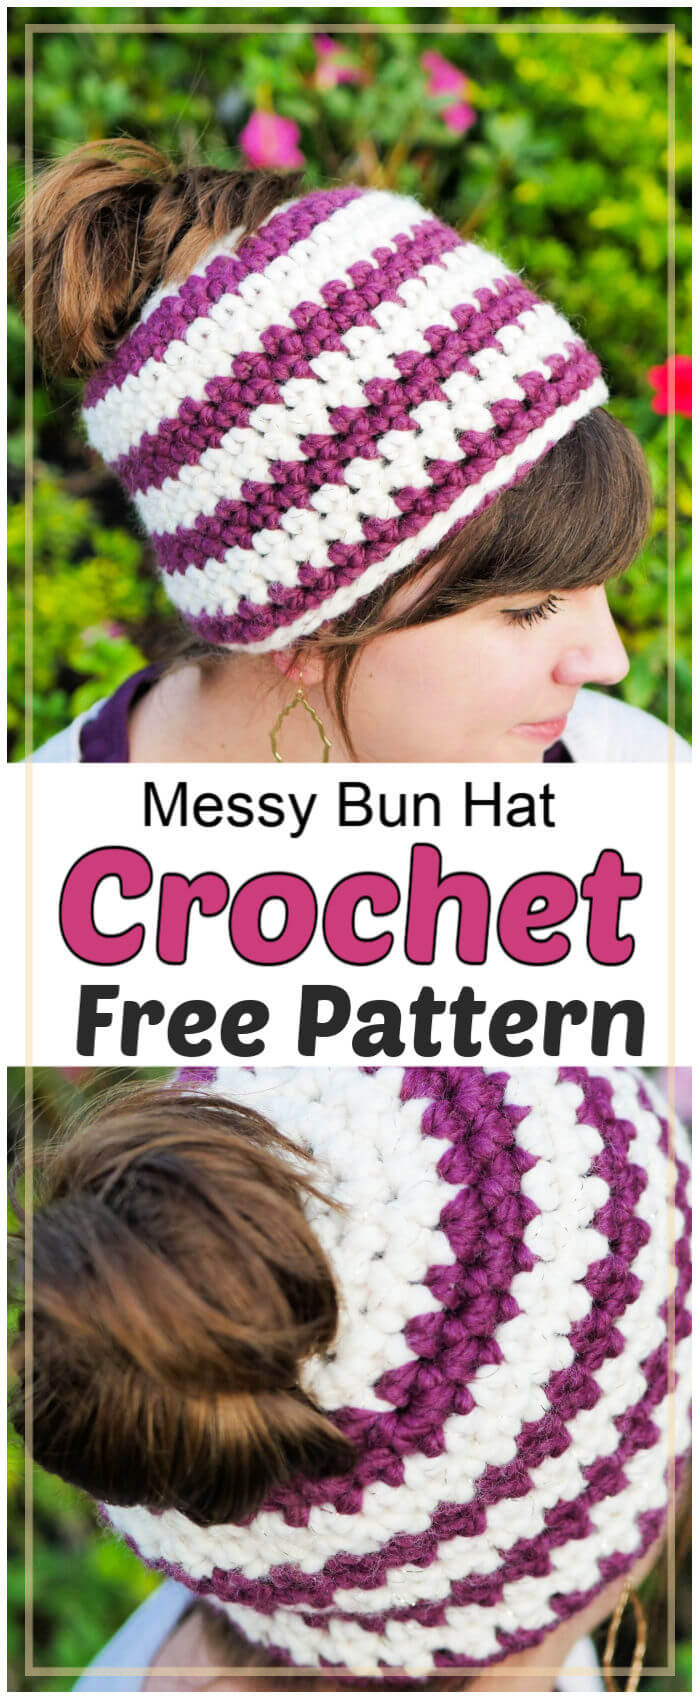 Crochet Messy Bun Hat Free Pattern